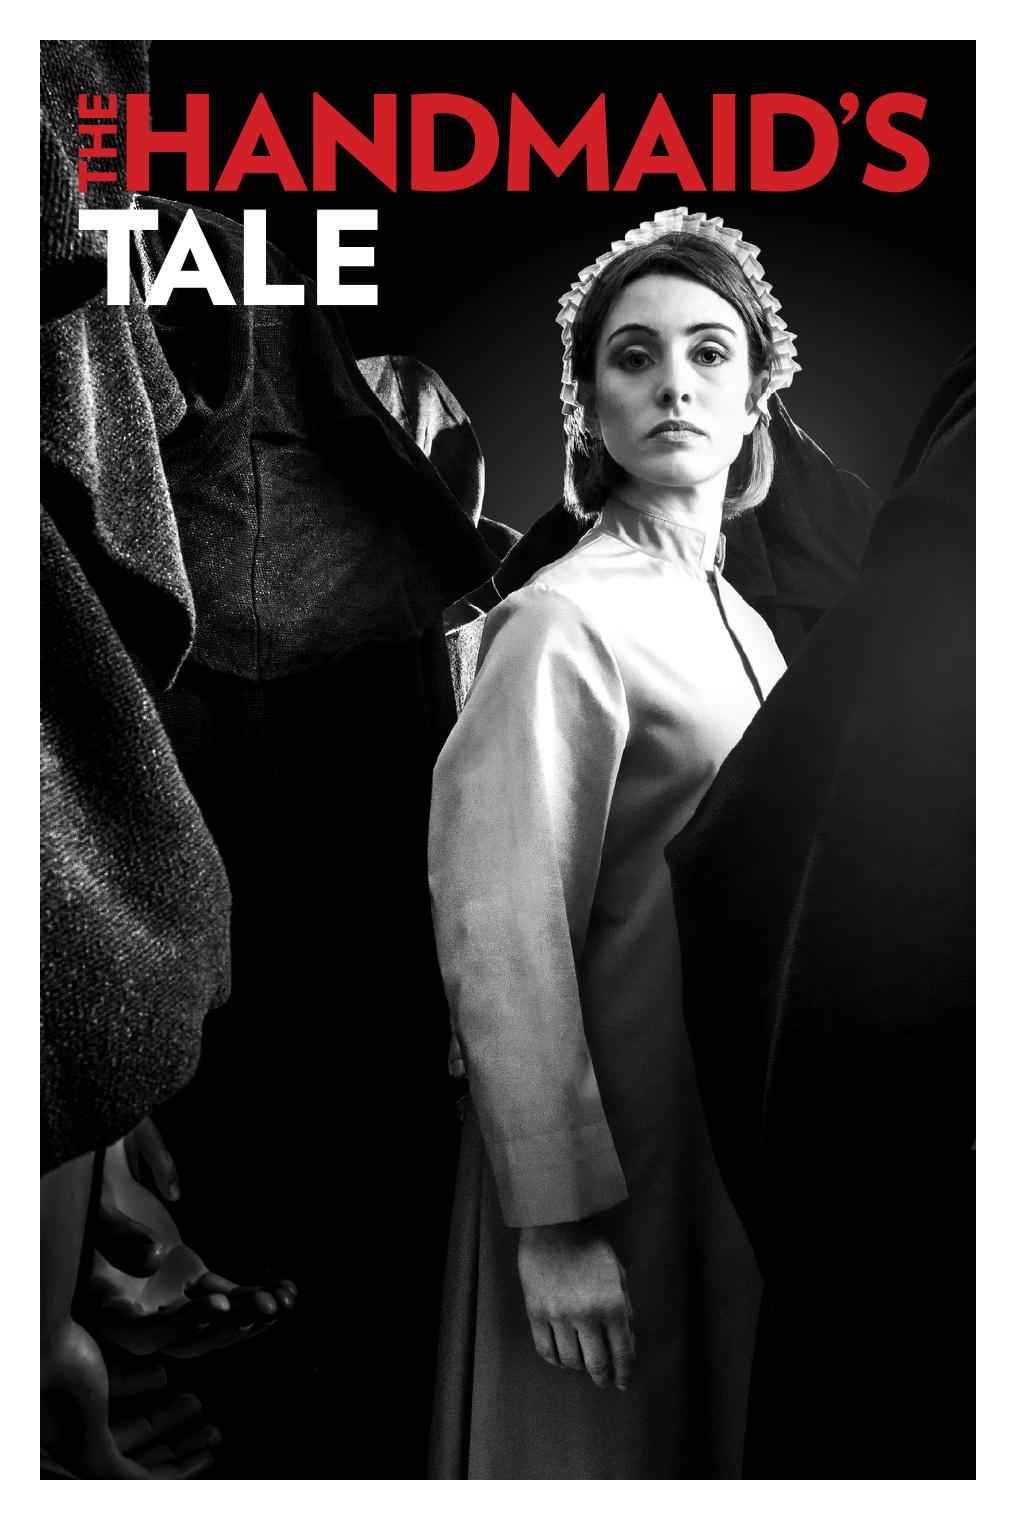 The Handmaid's Tale, Boston Lyric Opera, MAY 5–12 | 2019